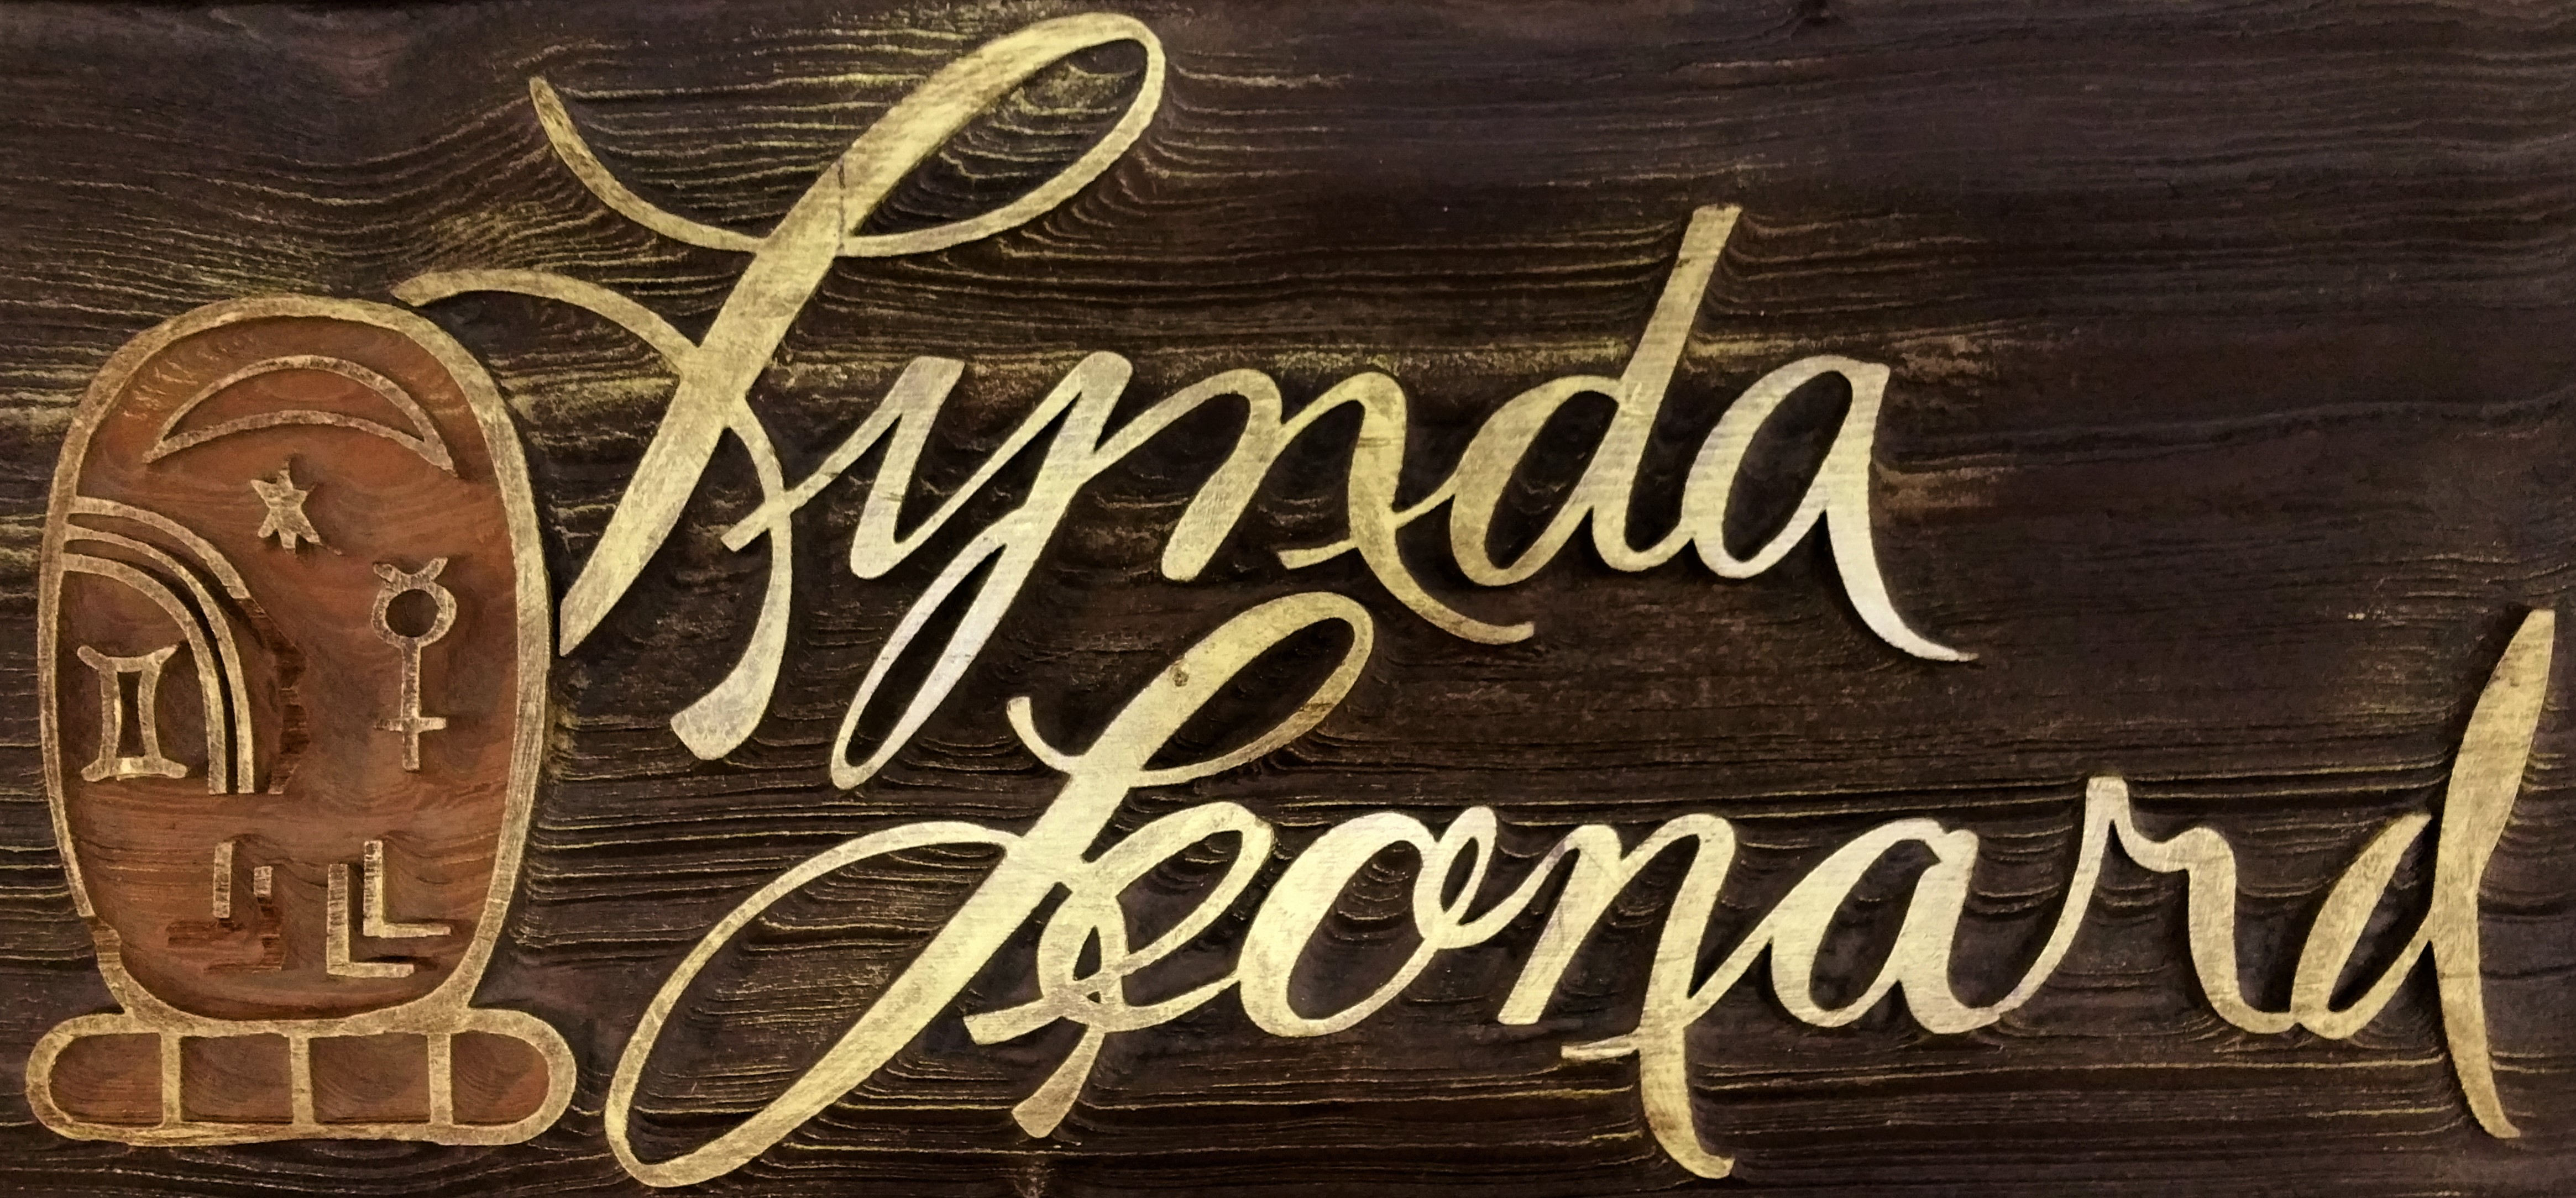 Lynda Leonard's Signature